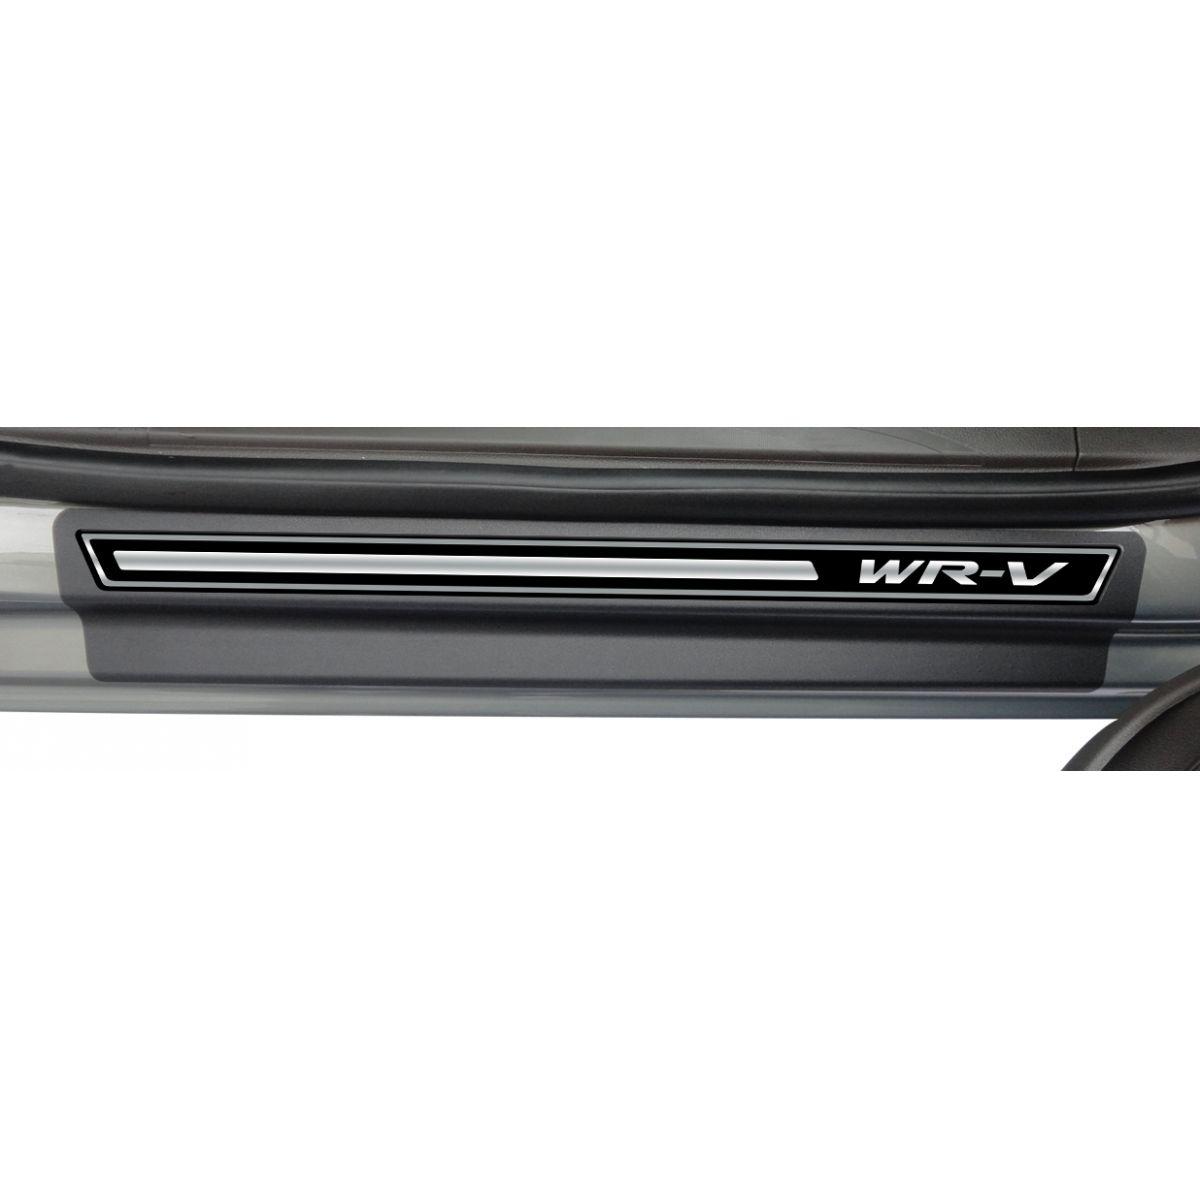 Soleira de Porta Premium Honda WRV 2017  - Só Frisos Ltda